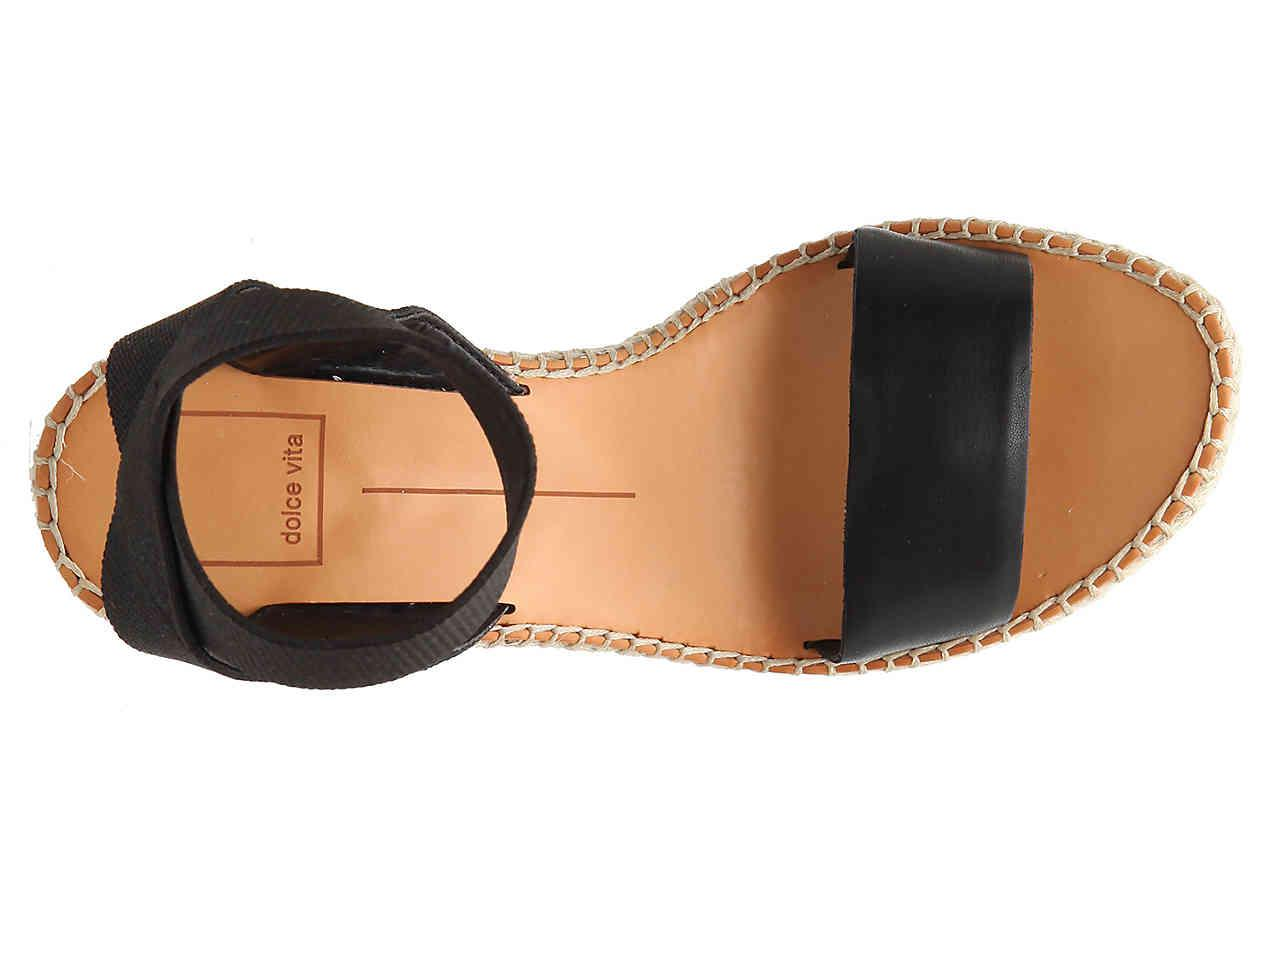 8a553c53661 Dolce Vita - Black Pavlin Espadrille Wedge Sandal - Lyst. View fullscreen